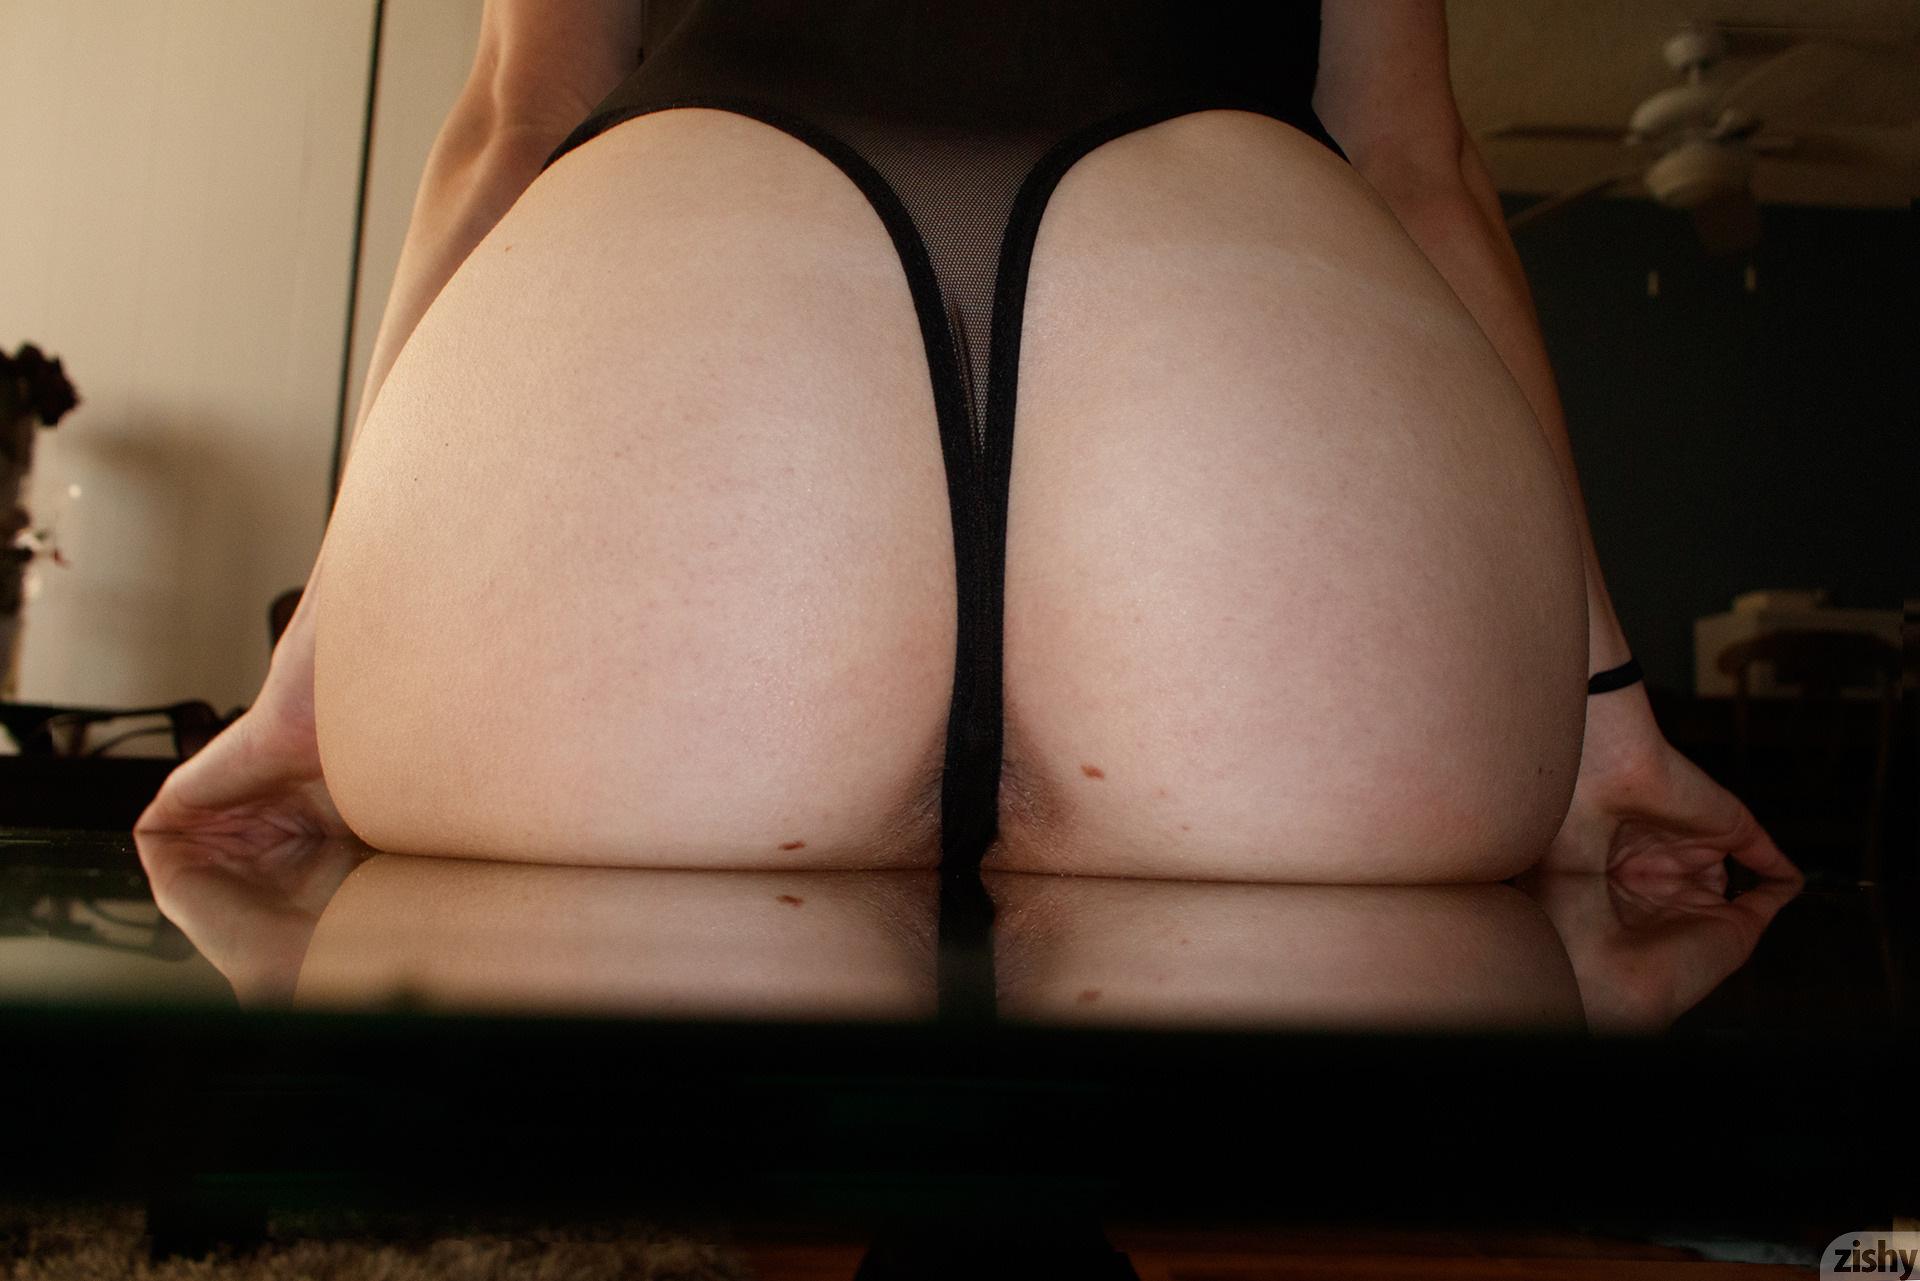 Giana Van Patten Black Coke Mirror Zishy (31)